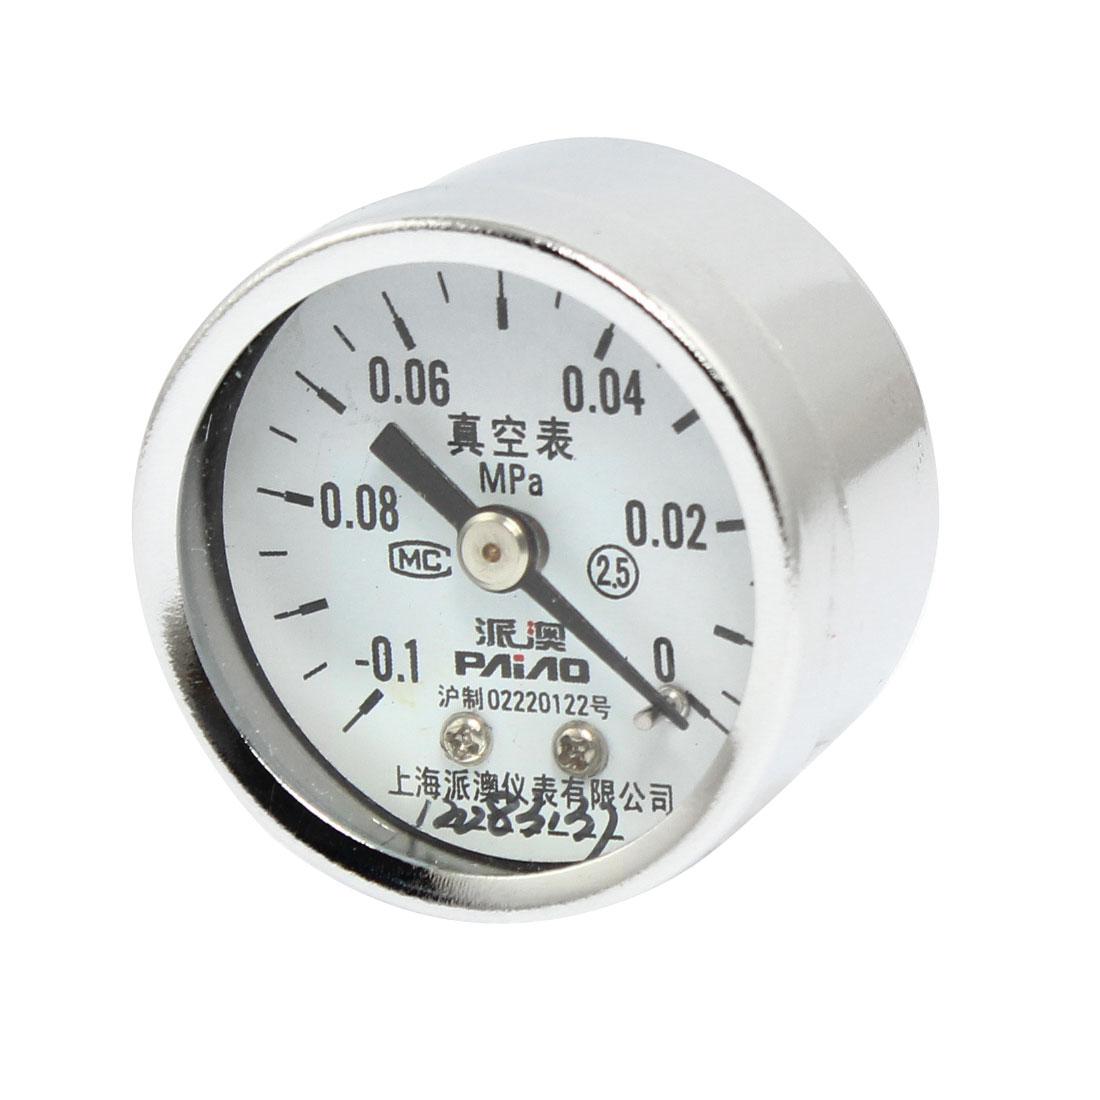 "Horizontal Mount 0.38"" Thread Pneumatic Air Pressure Vacuum Gauge -0.1-0 MPa"